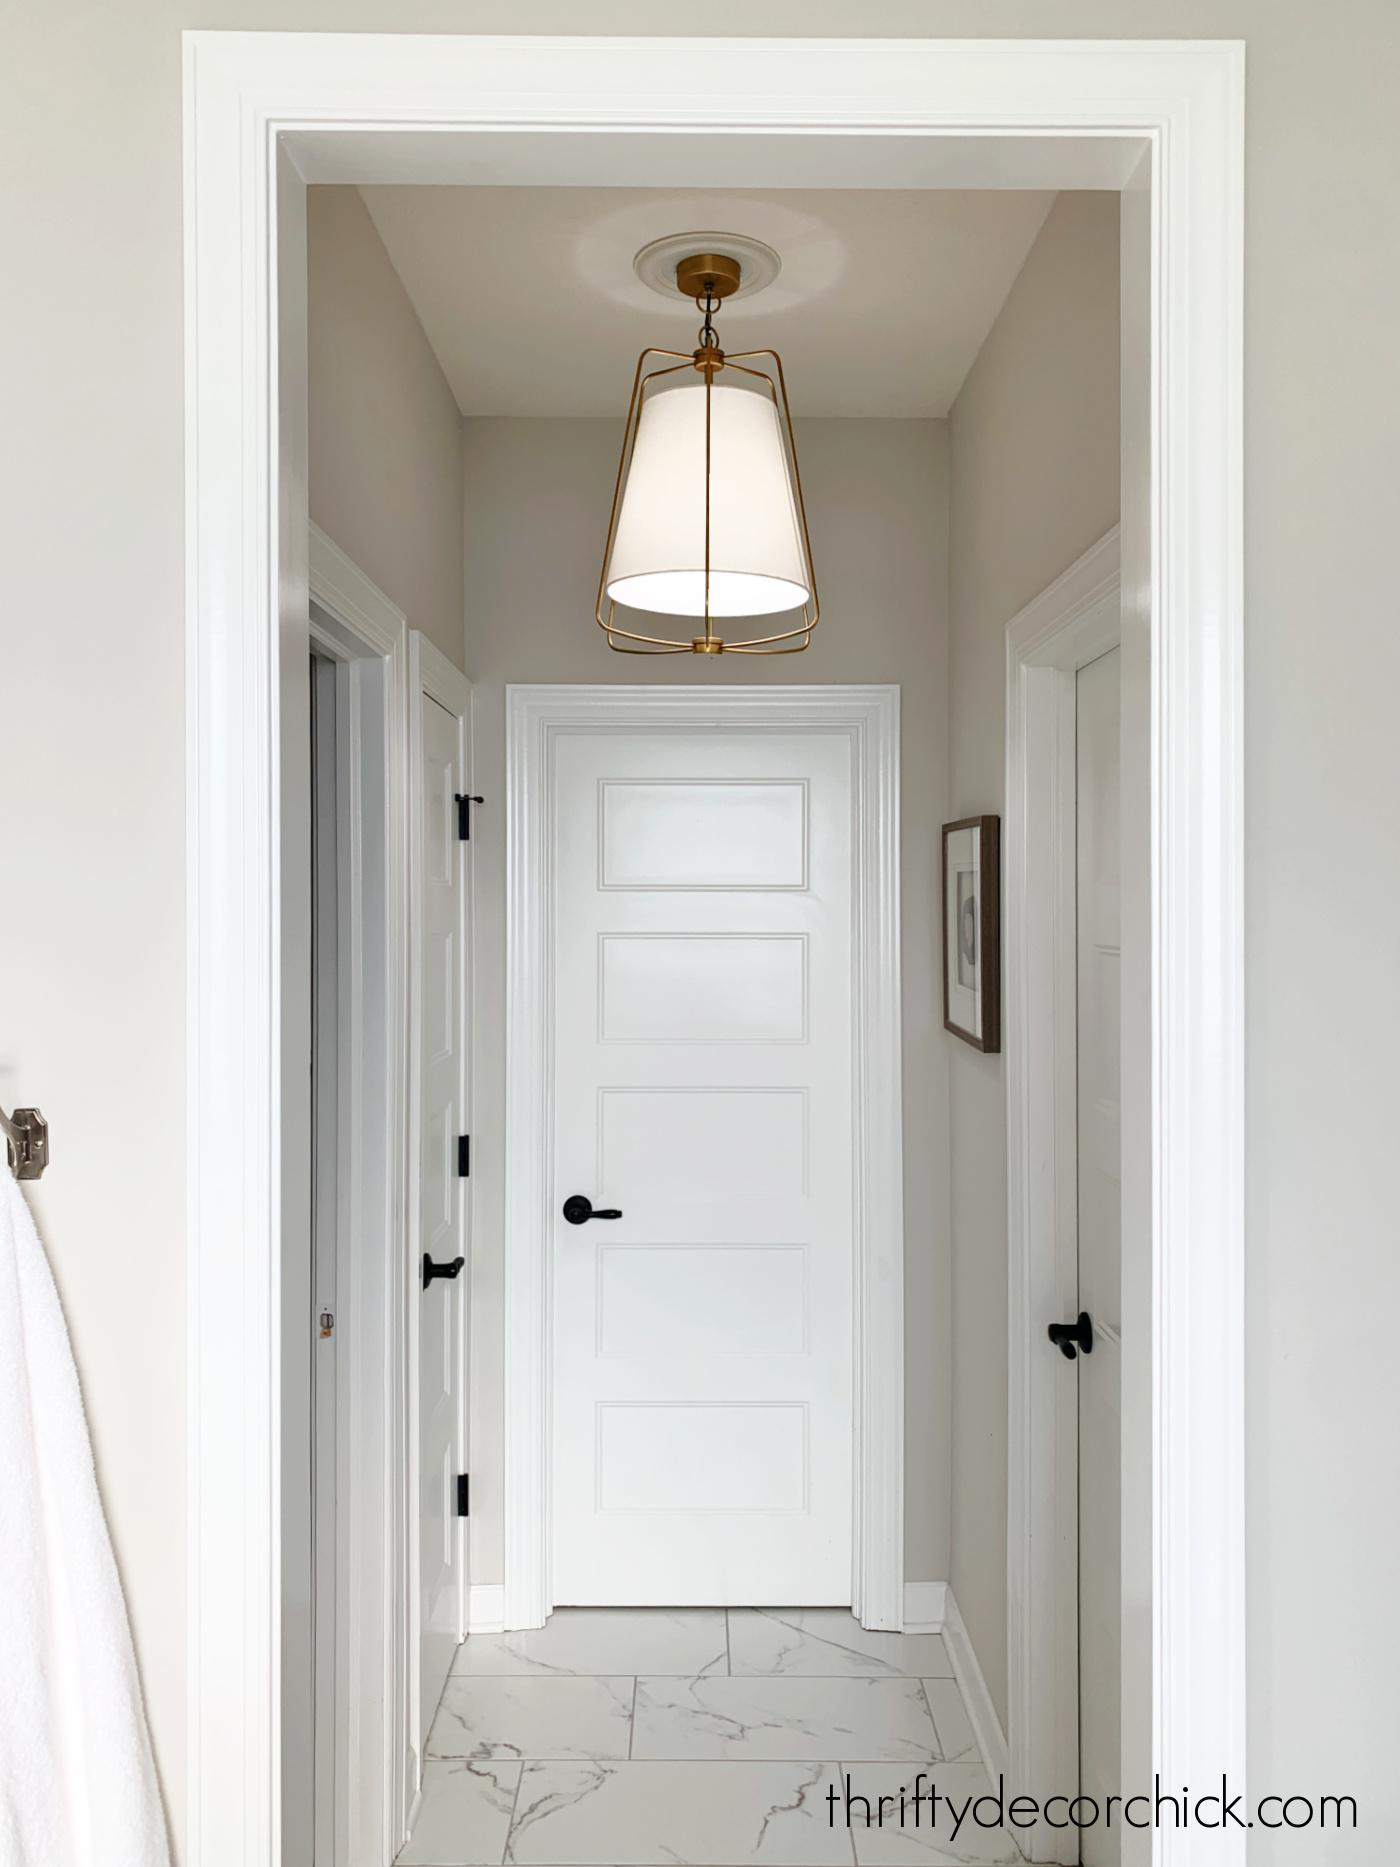 hanging brass light fixture in small hallway